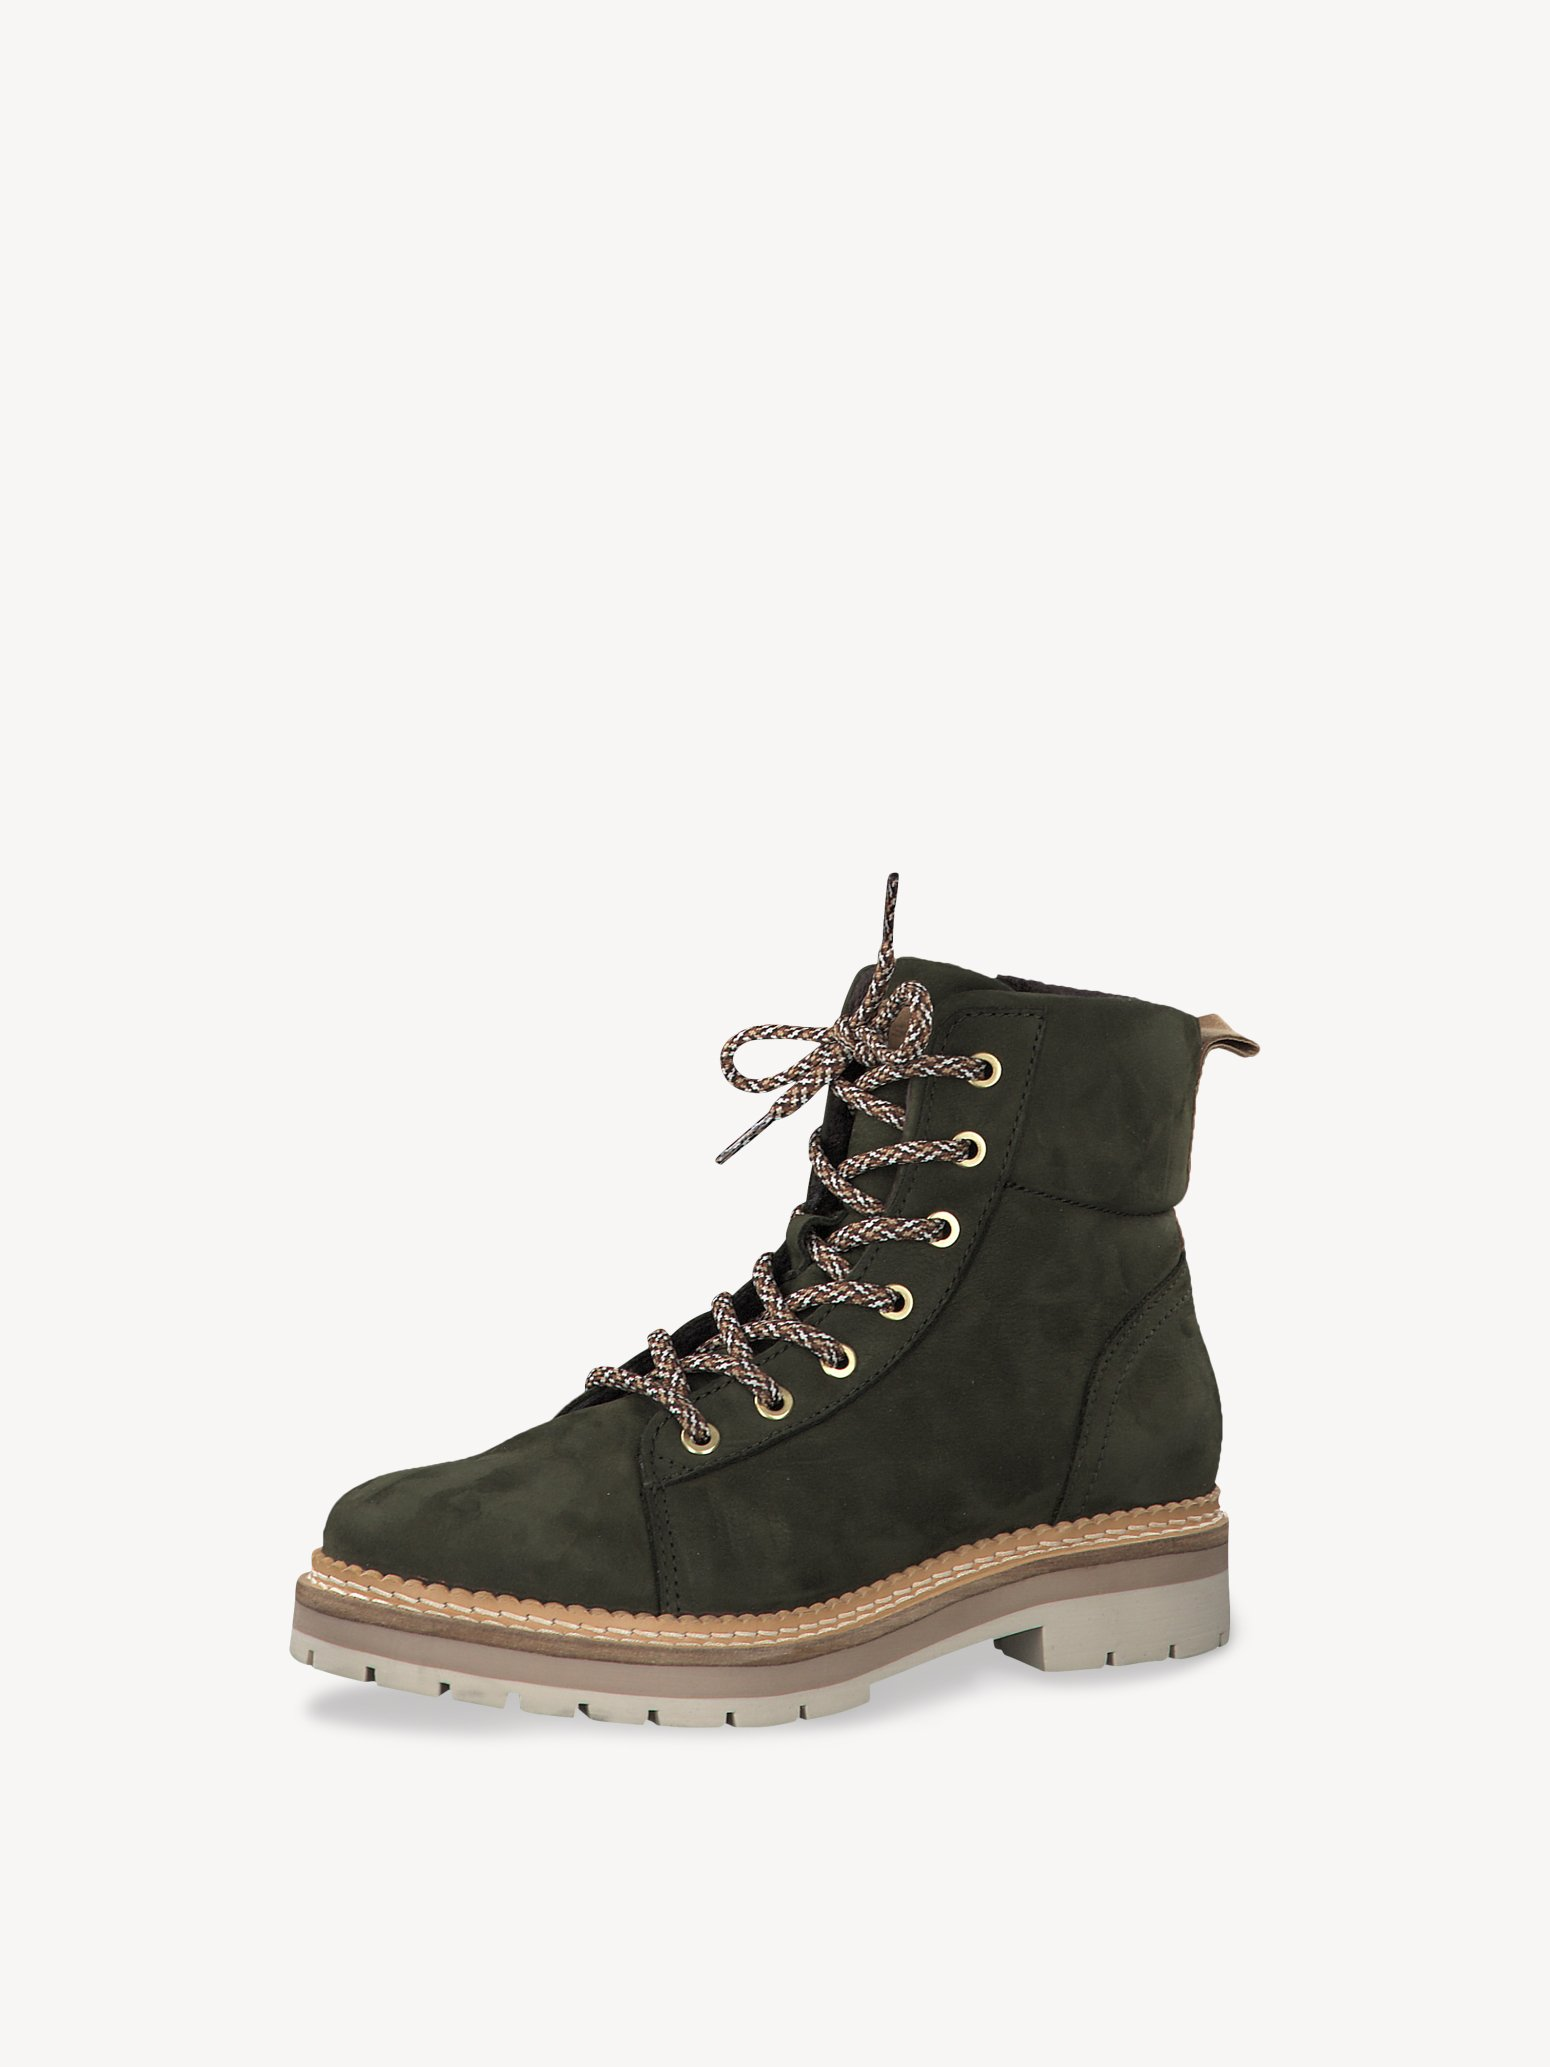 Ботинки Tamaris 1-1-25845-35-722